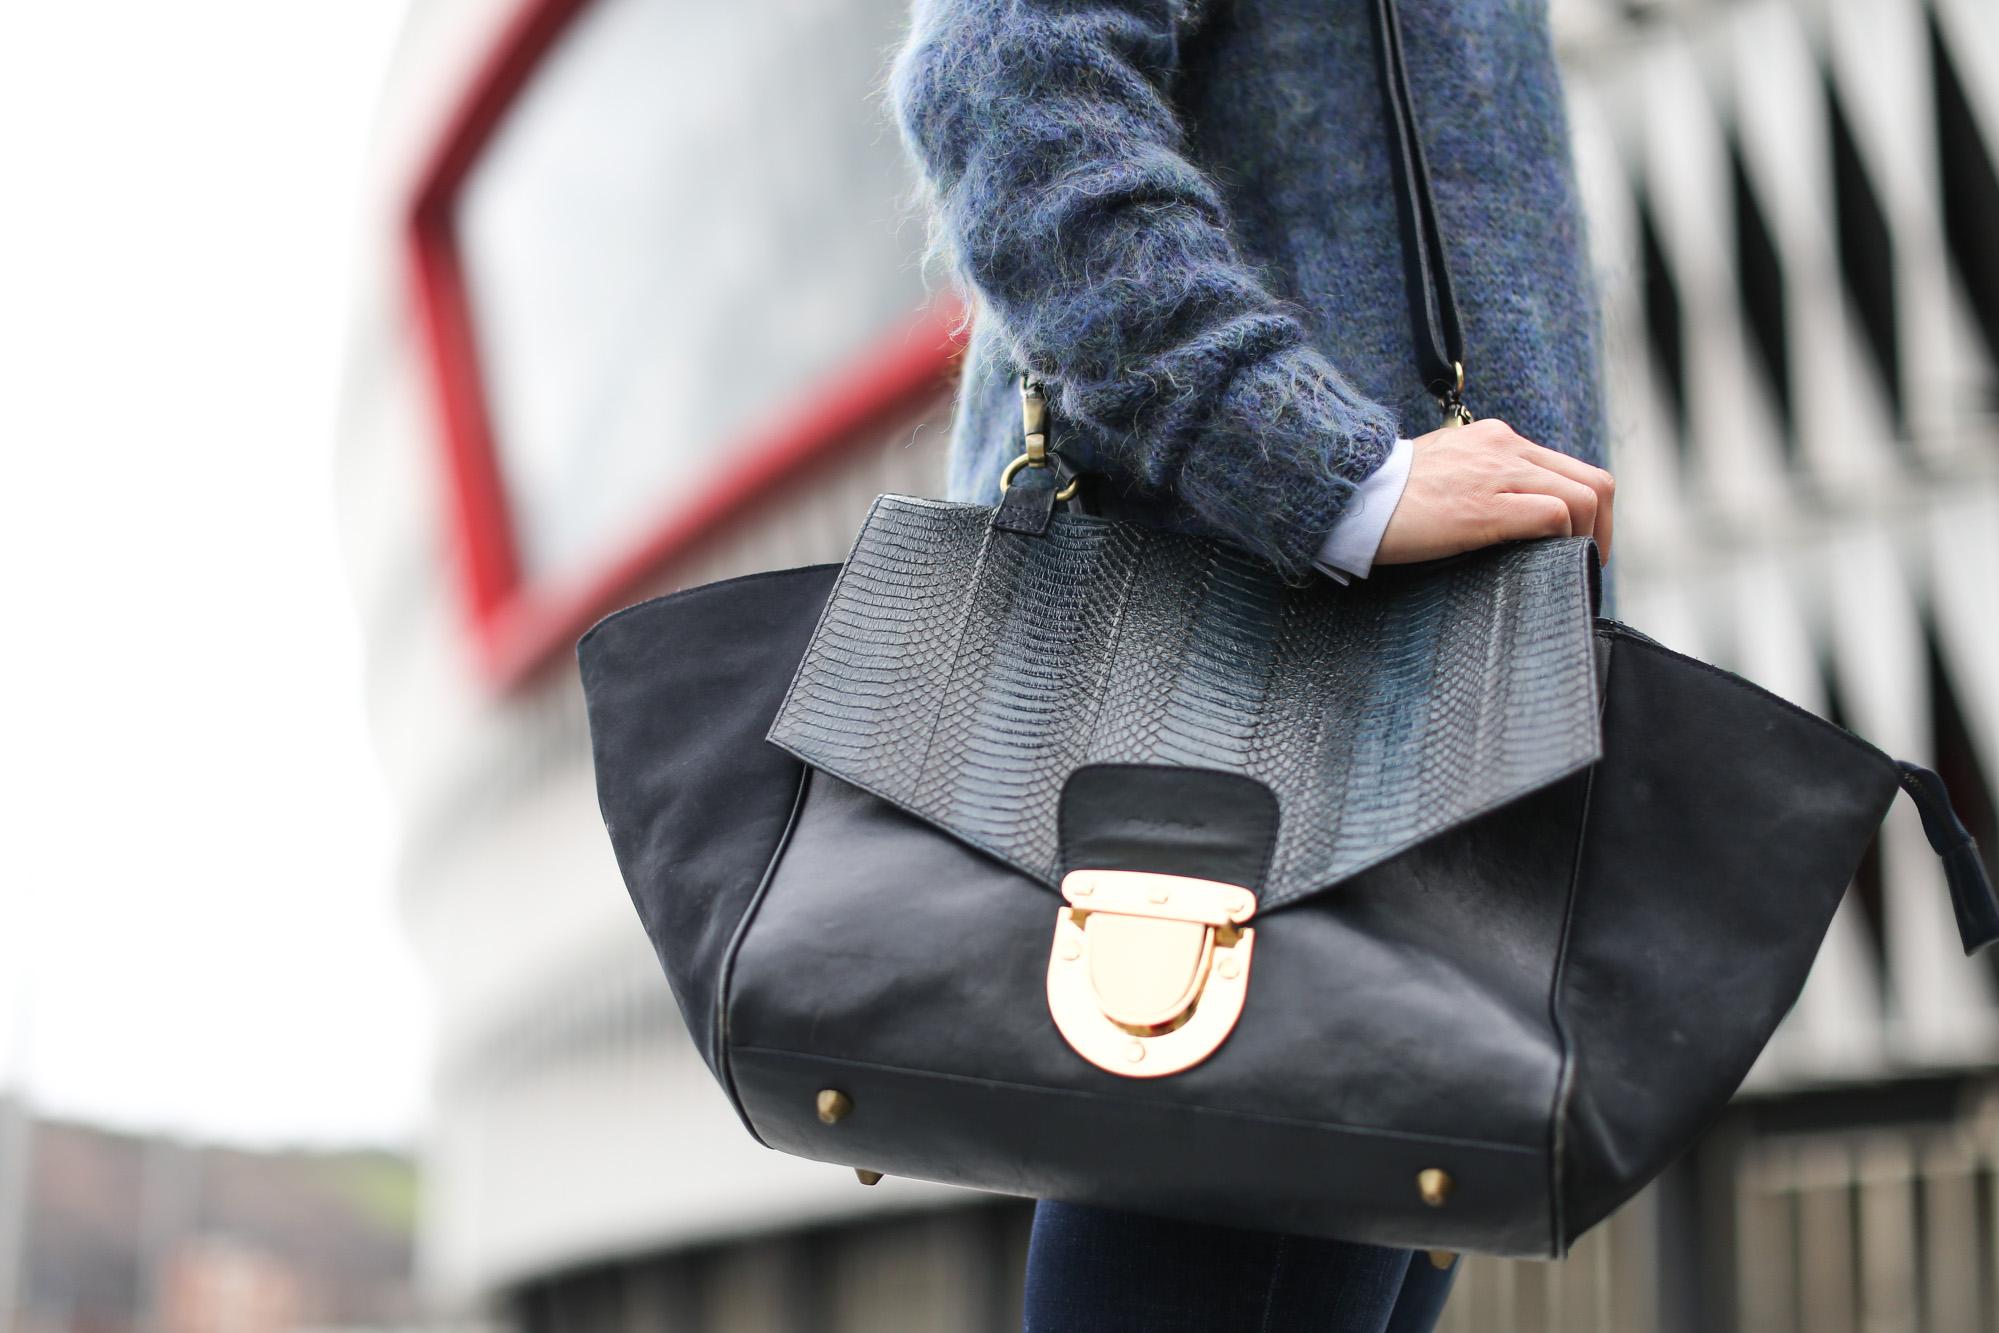 Clochet-streetstyle-bimbaylola-blue-knit-topshop-baxter-jeans-sushibag-3